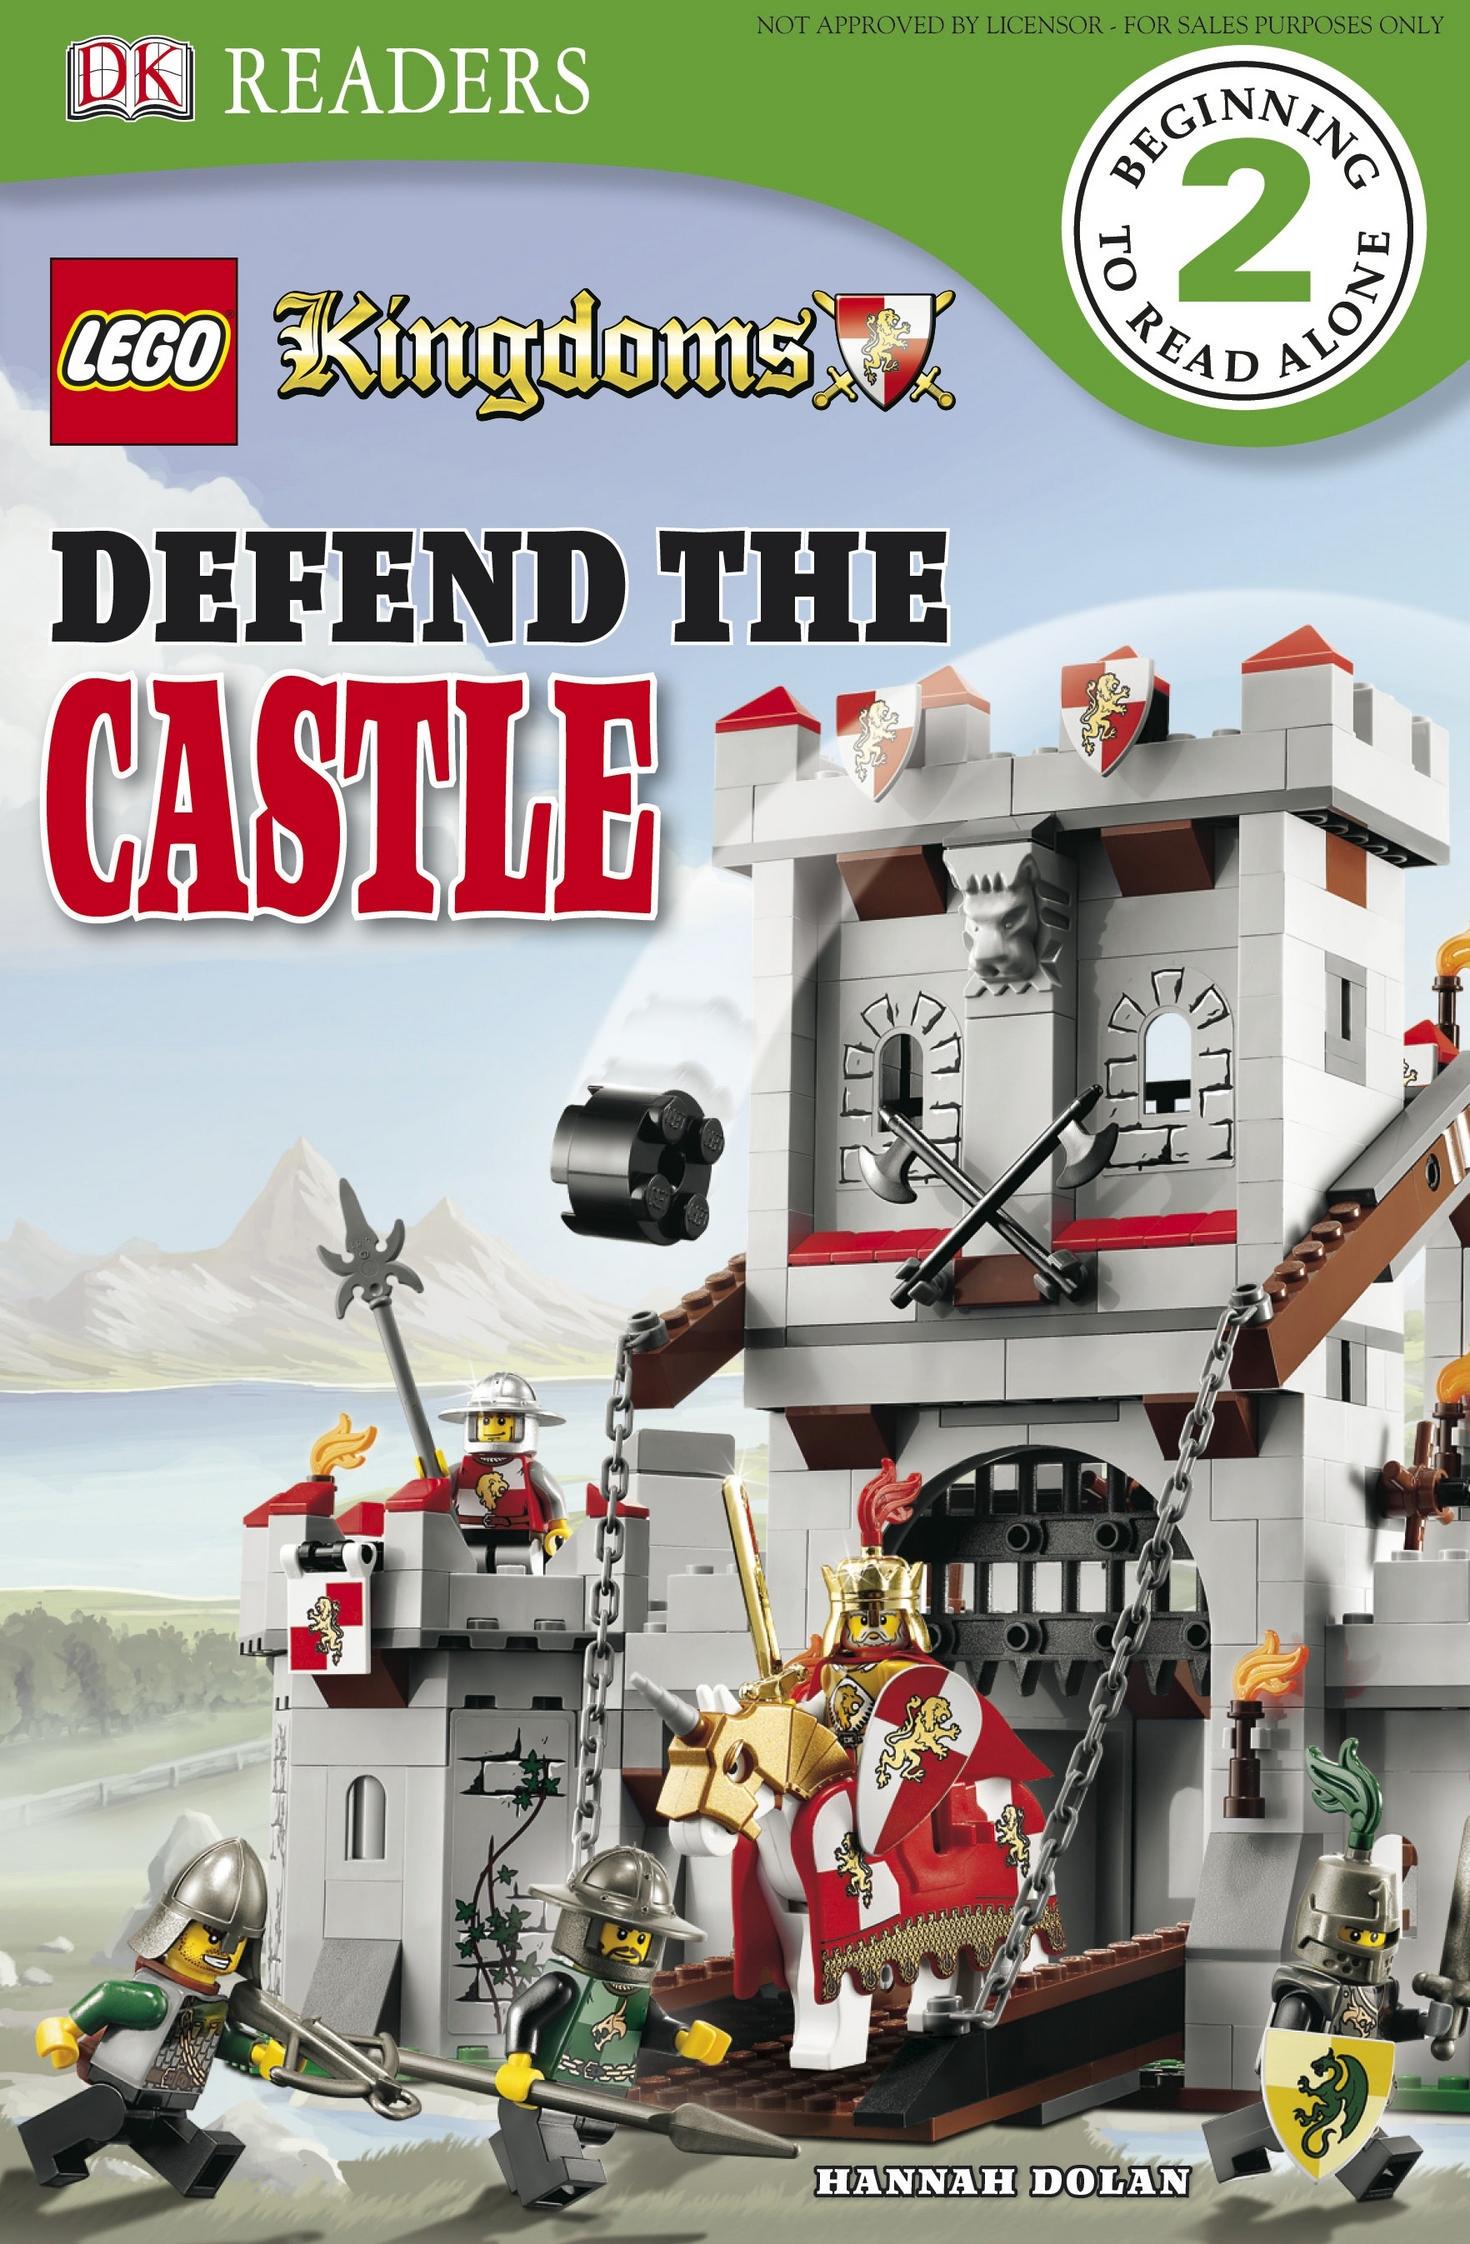 defend the castle